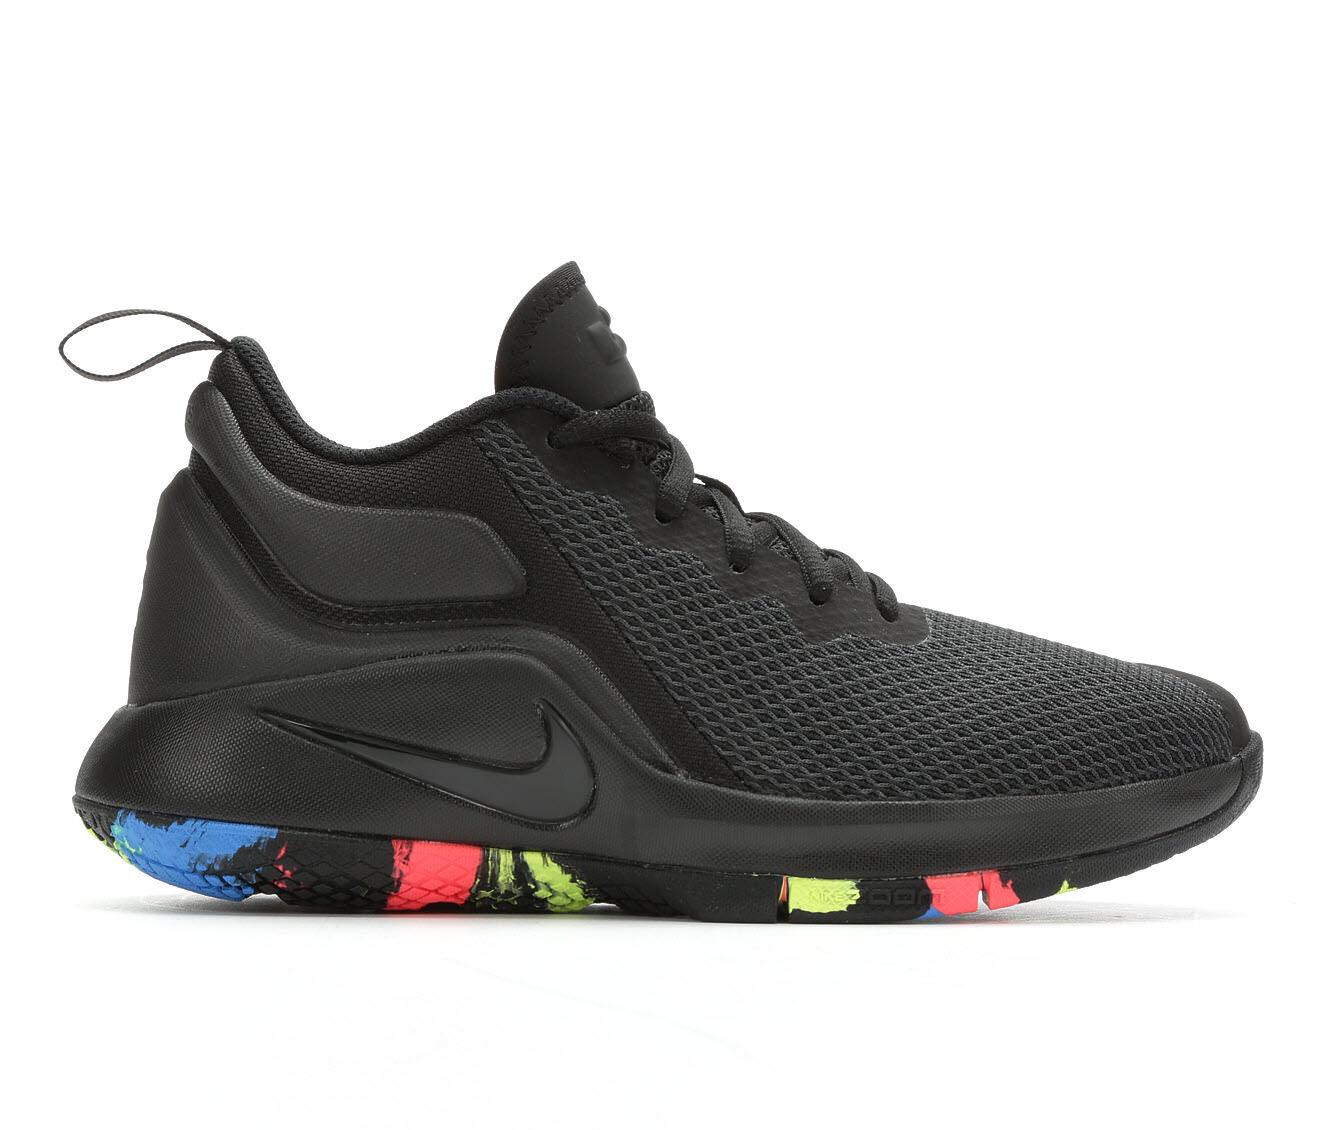 brand new 2d7cd 3f9fe ... czech boys nike lebron witness ii 3.5 7 high top basketball shoes shoe  carnival d3d55 03525